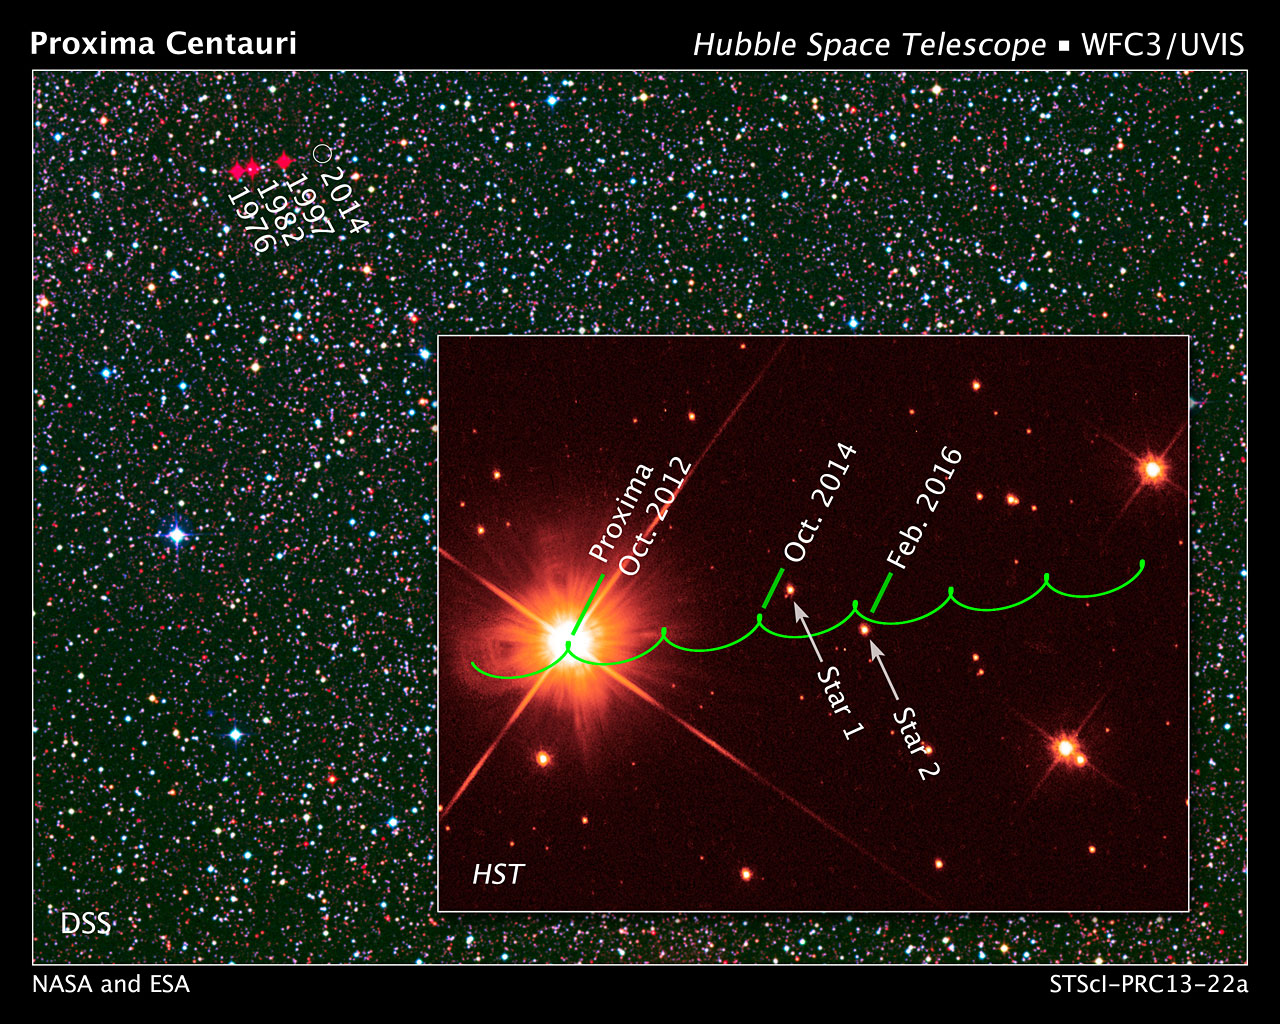 Proxima Centauri proper motion